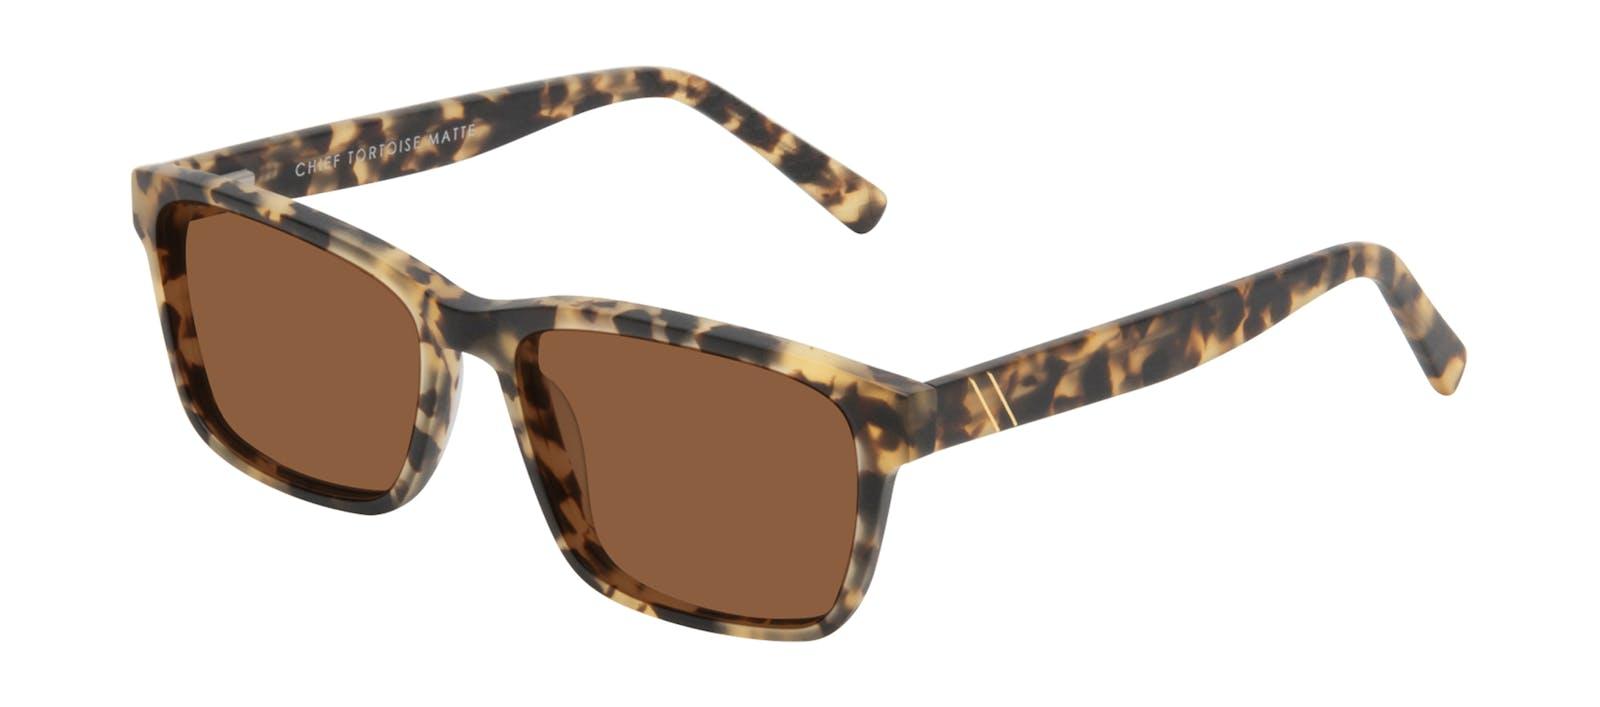 63619bcc38 Affordable Fashion Glasses Square Sunglasses Men Chief Tortoise Matte Tilt